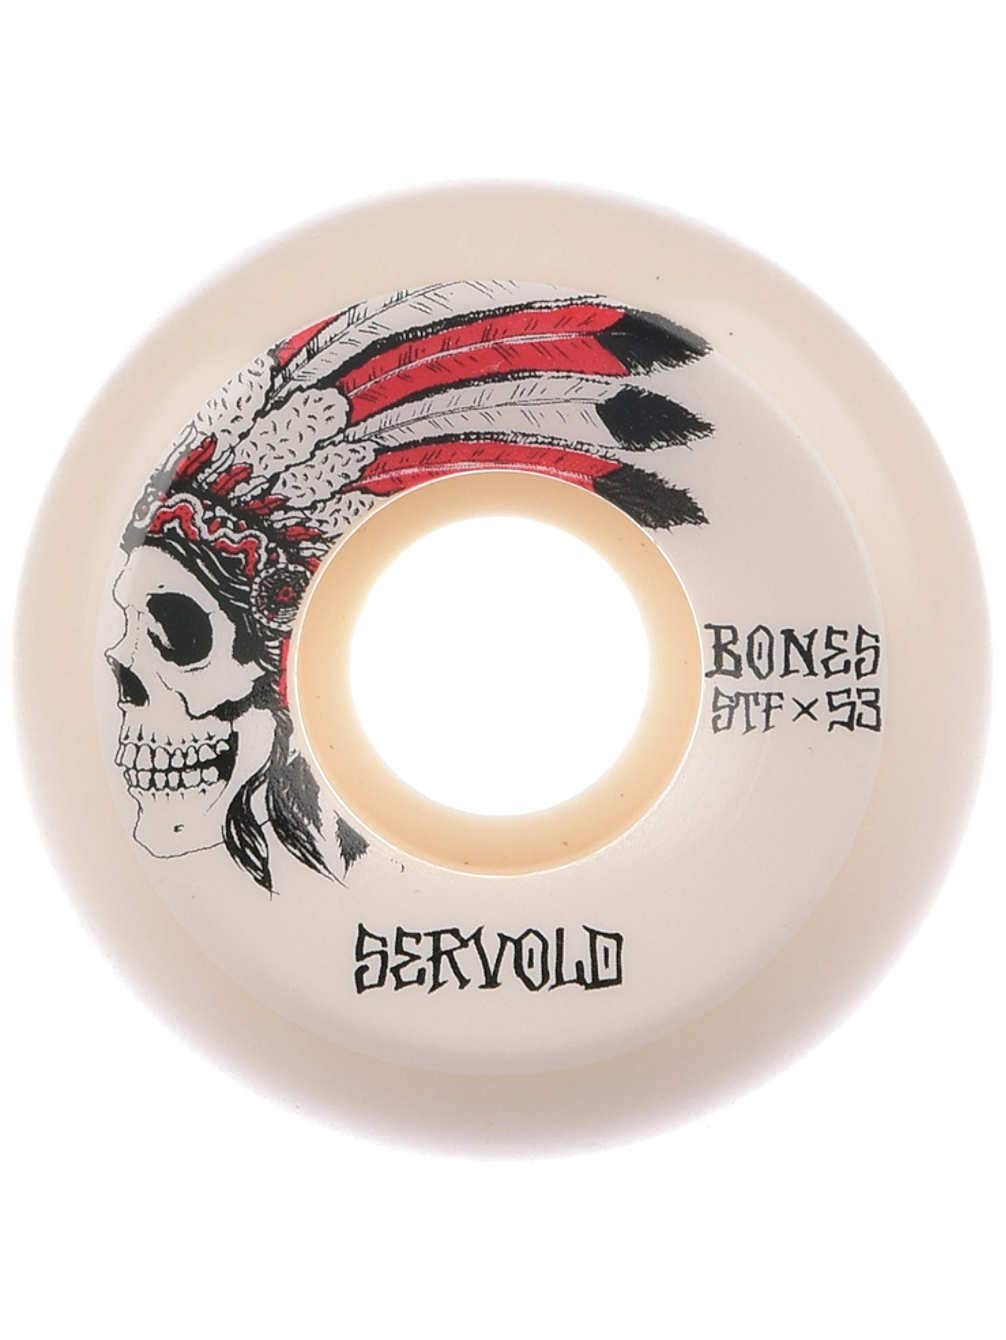 Bones STF Servold Spirit V5 スケートボードホイール 53mm   B07J1Z7C7Q